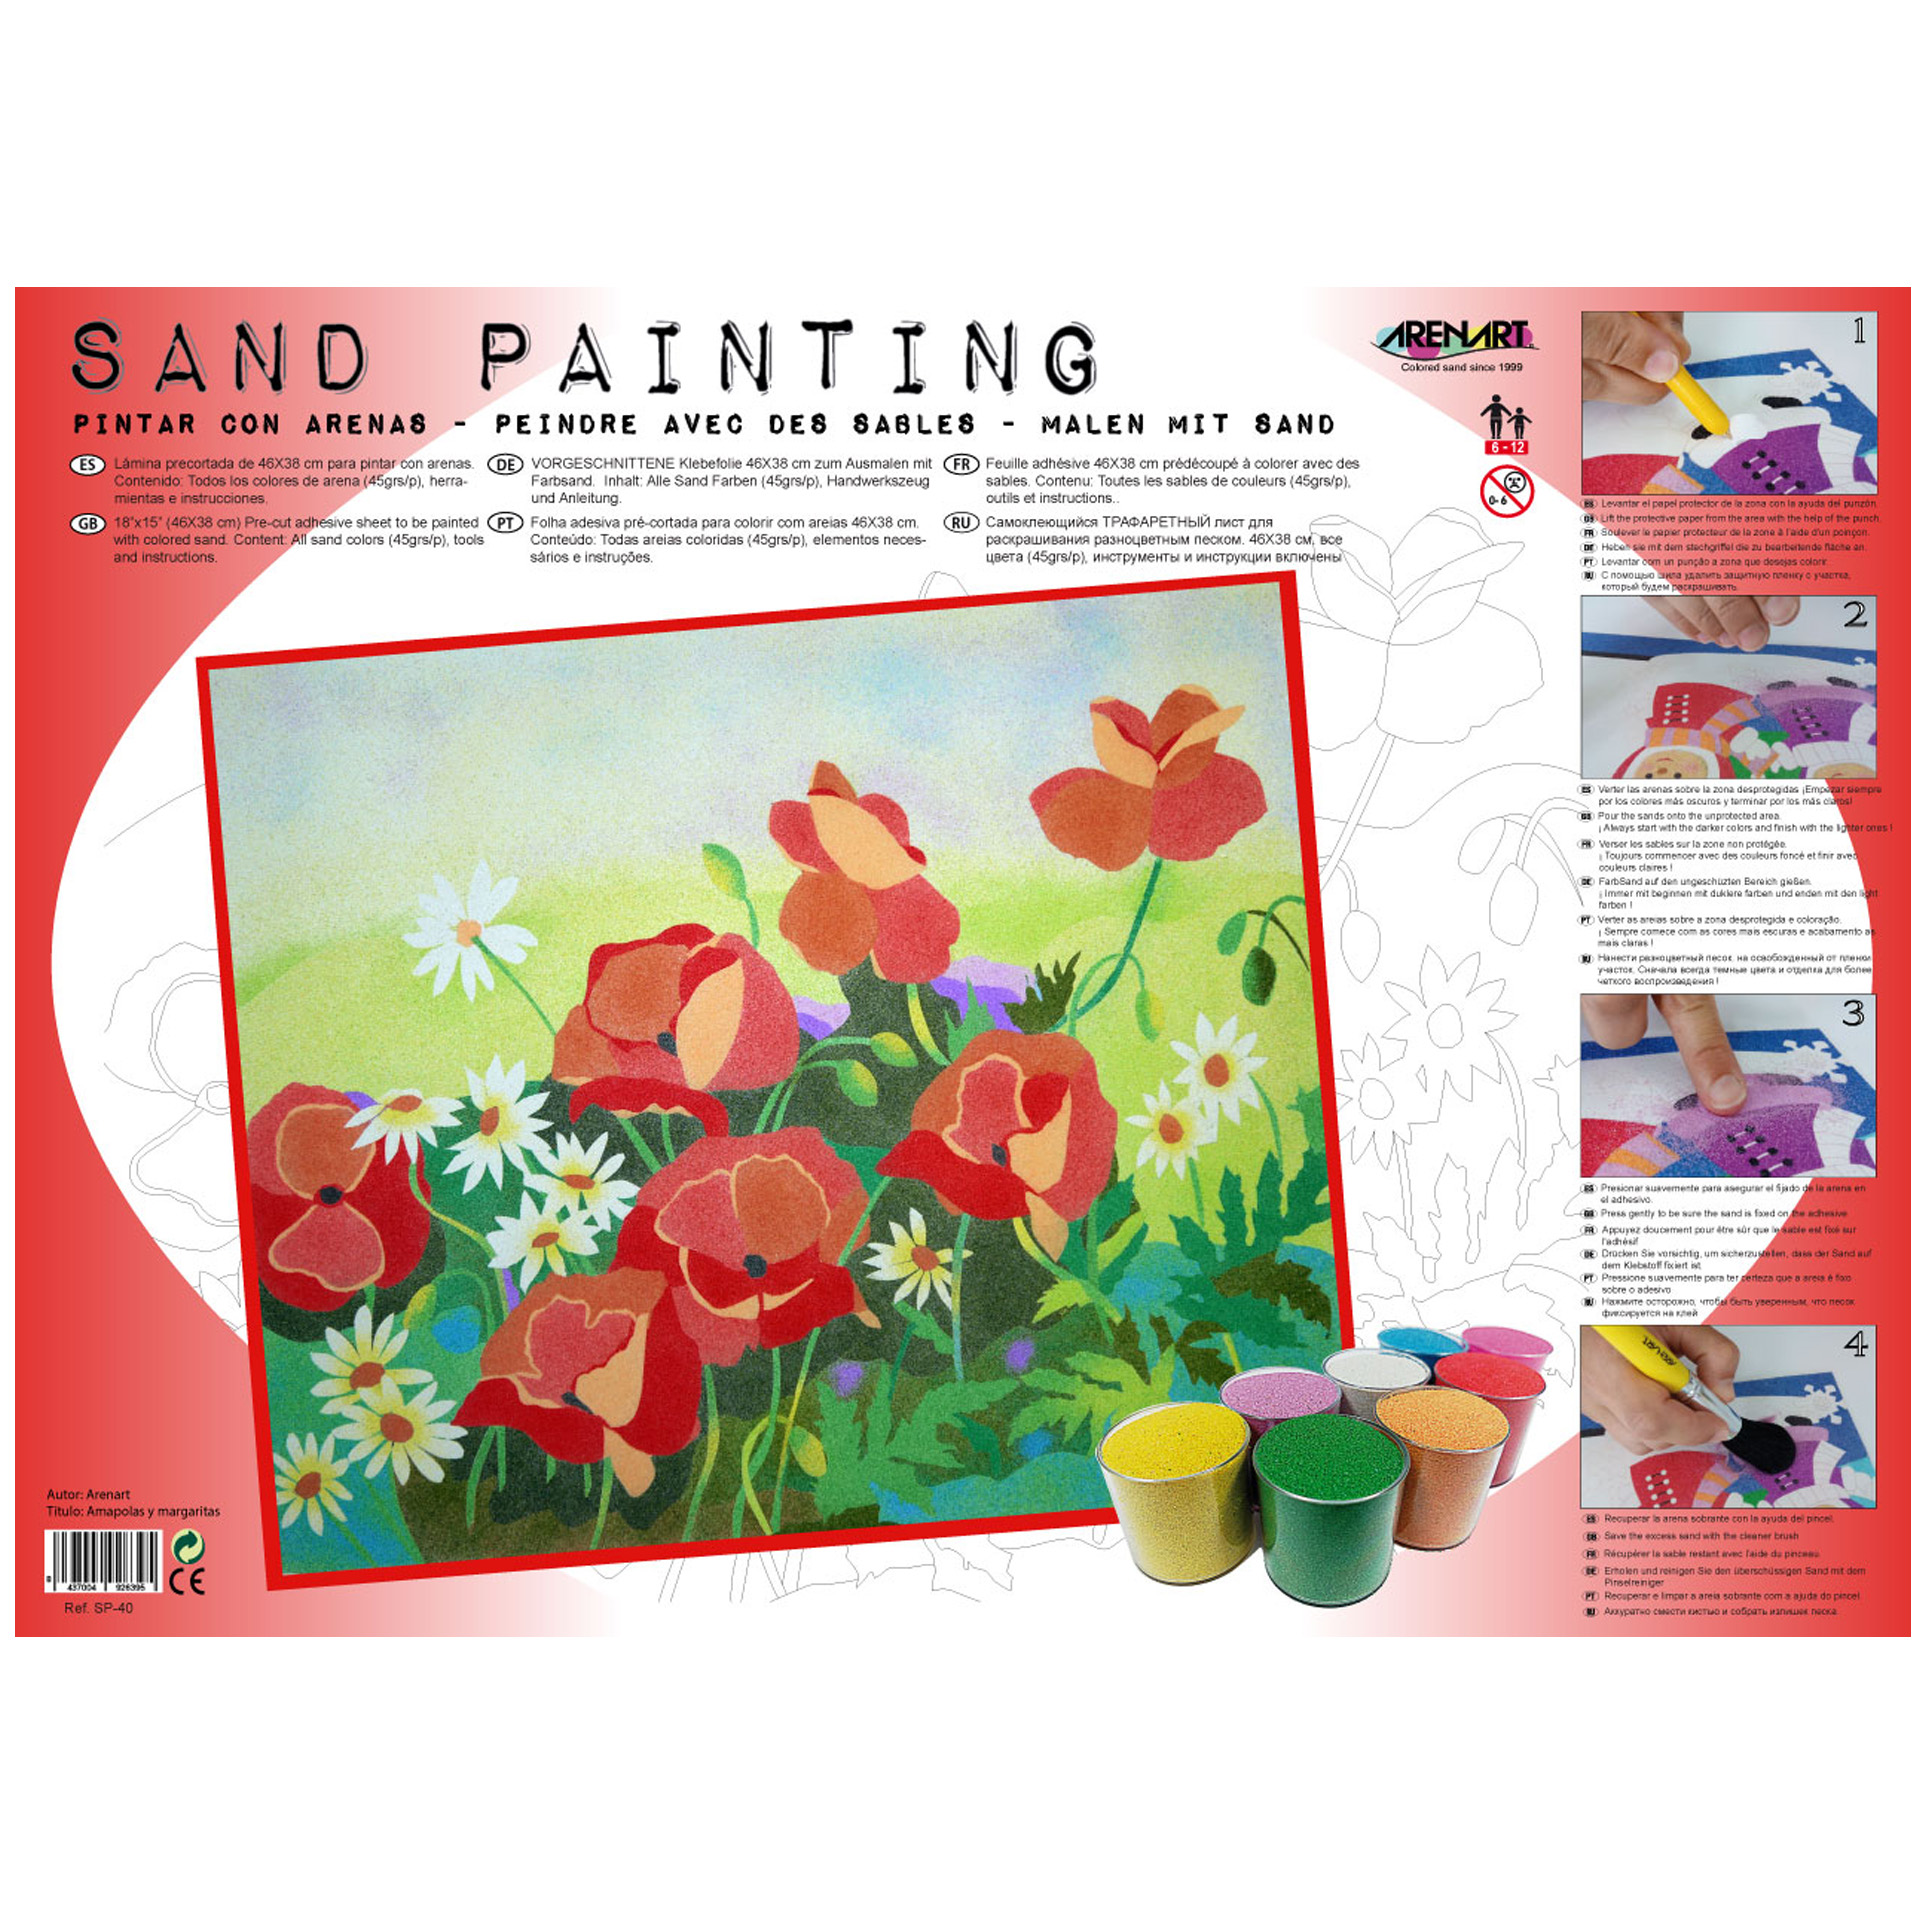 Sand Painting Amapolas y margaritas